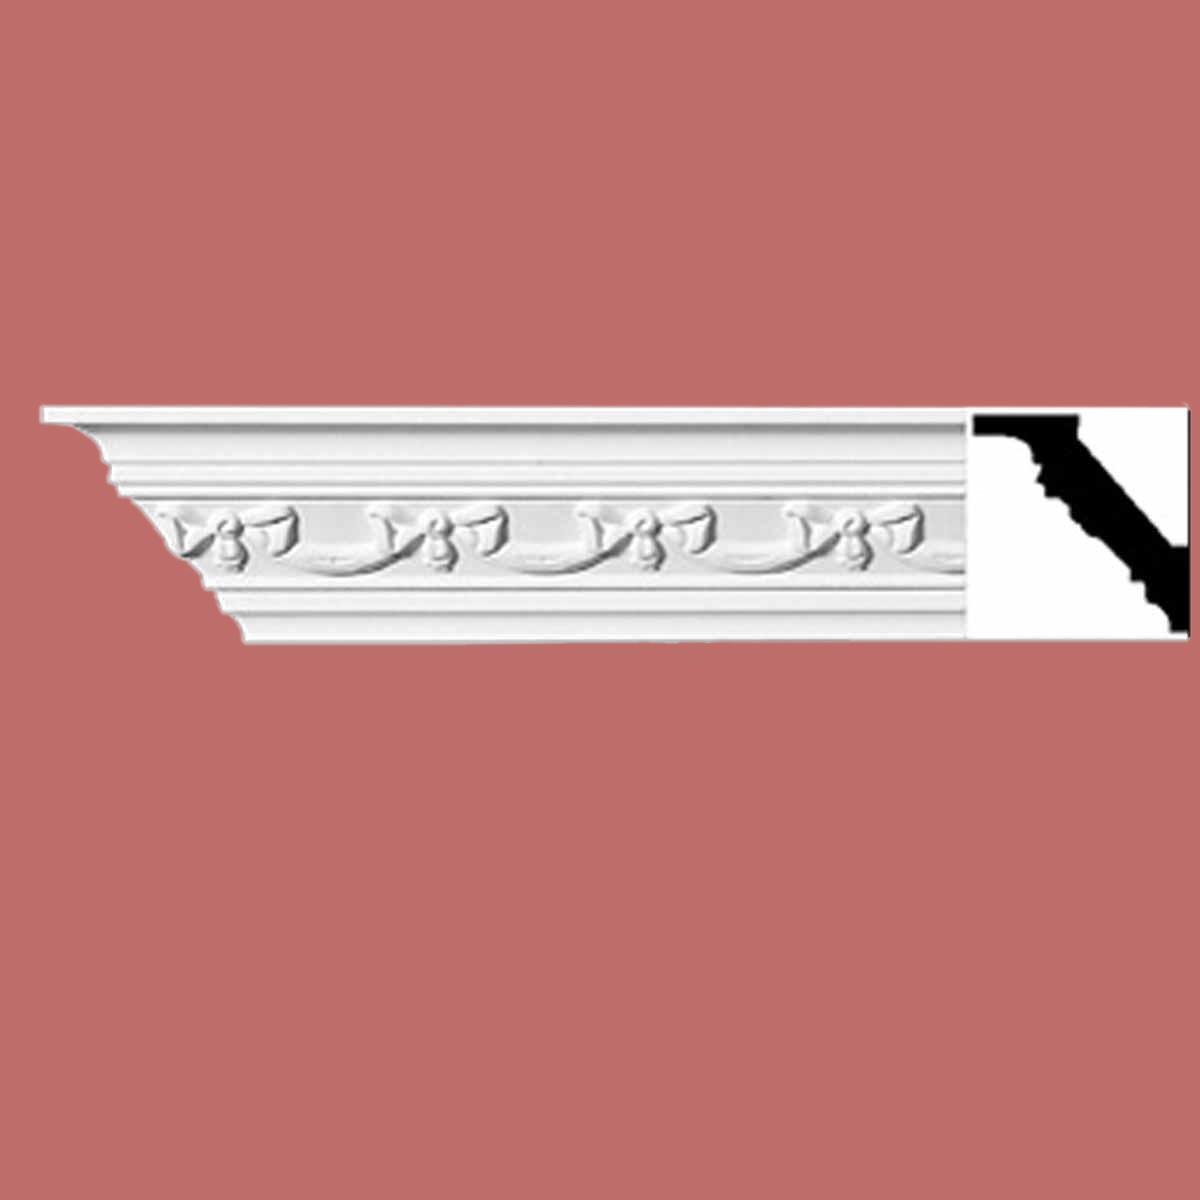 Cornice White Urethane Sample of 11193 Cornice Cornice Moulding Cornice Molding